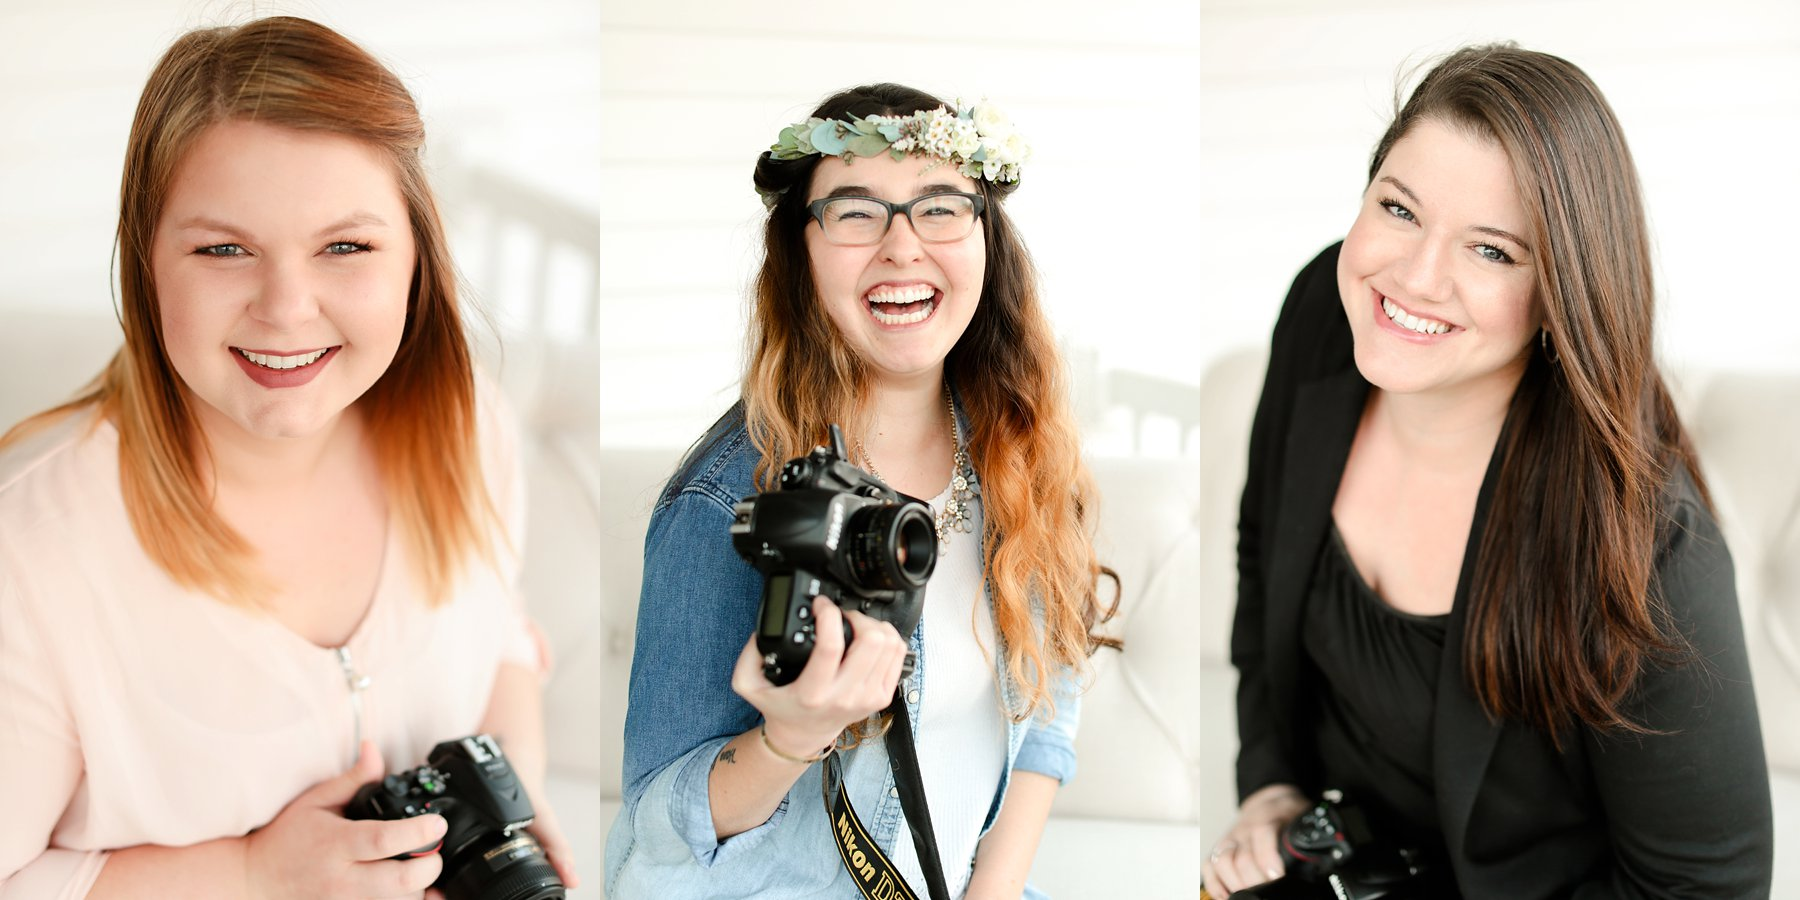 photographer_wedding_saint_louis_Kansas_City_Photography_Videography_workshop_training_styled_engagement_Lake_Ozark_KC_MO_STL_Rolla_Hermann_Saint_James_0423.jpg